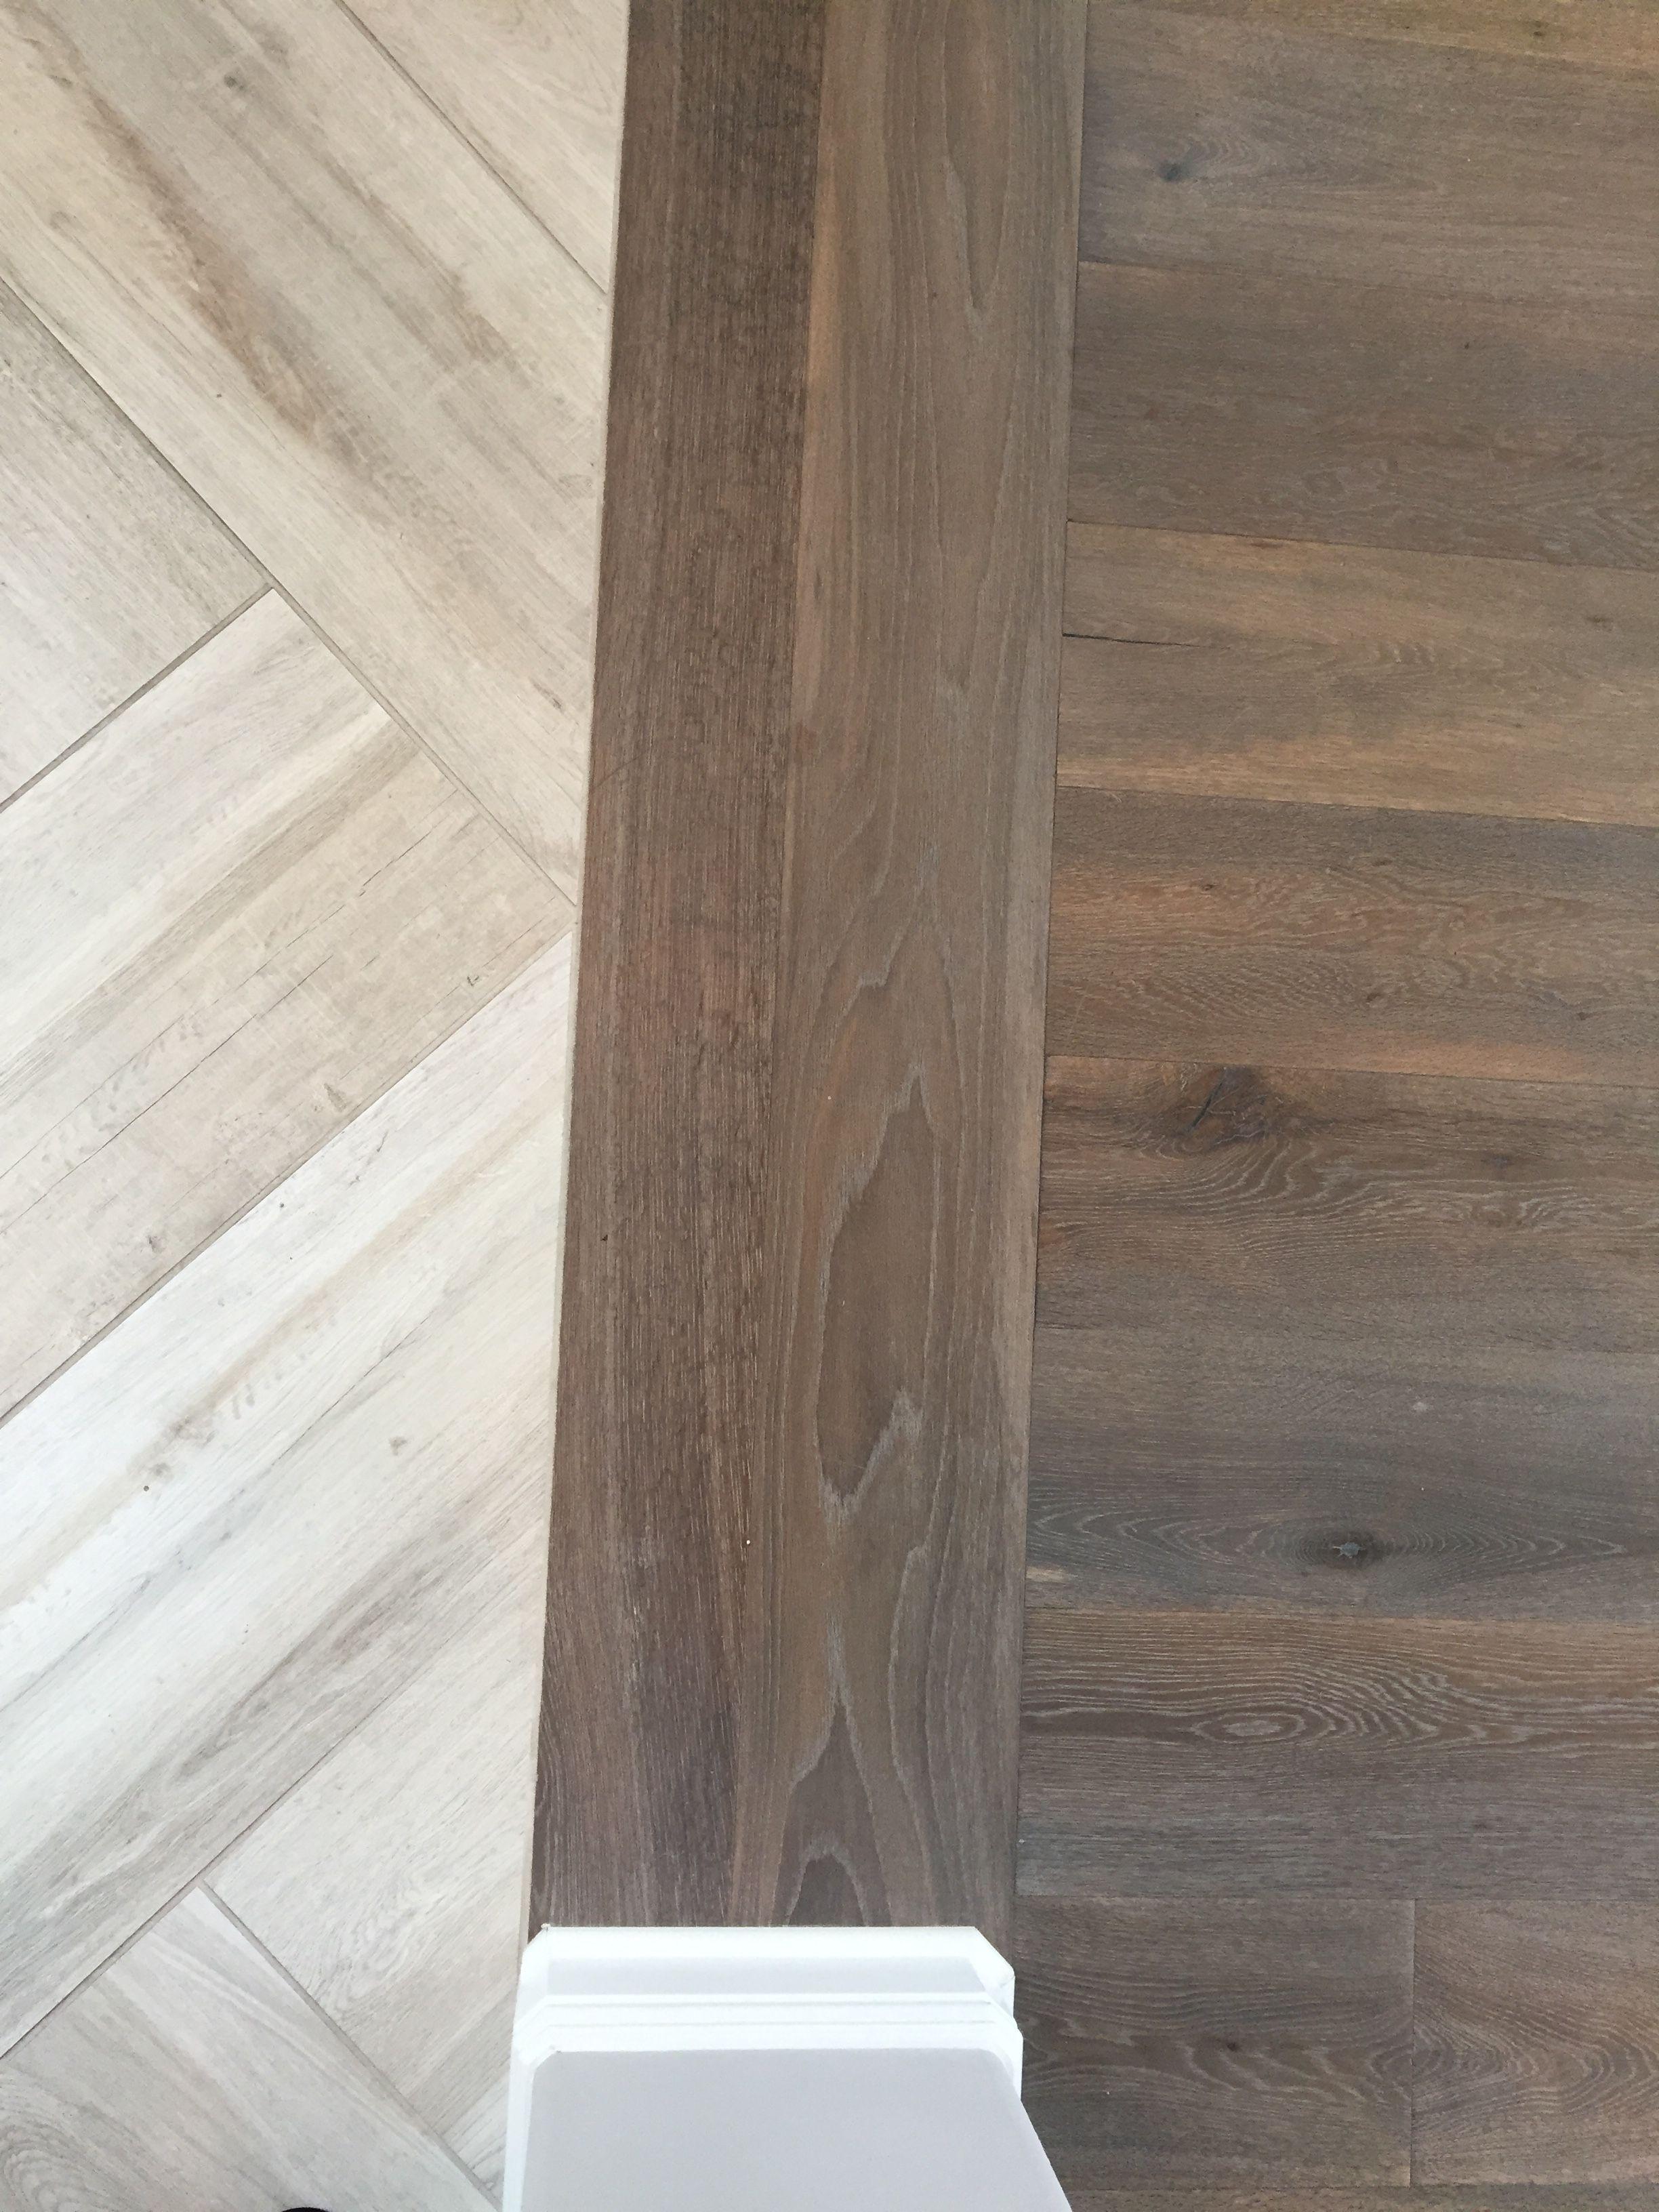 hardwood flooring victoria bc of floor transition laminate to herringbone tile pattern model with floor transition laminate to herringbone tile pattern